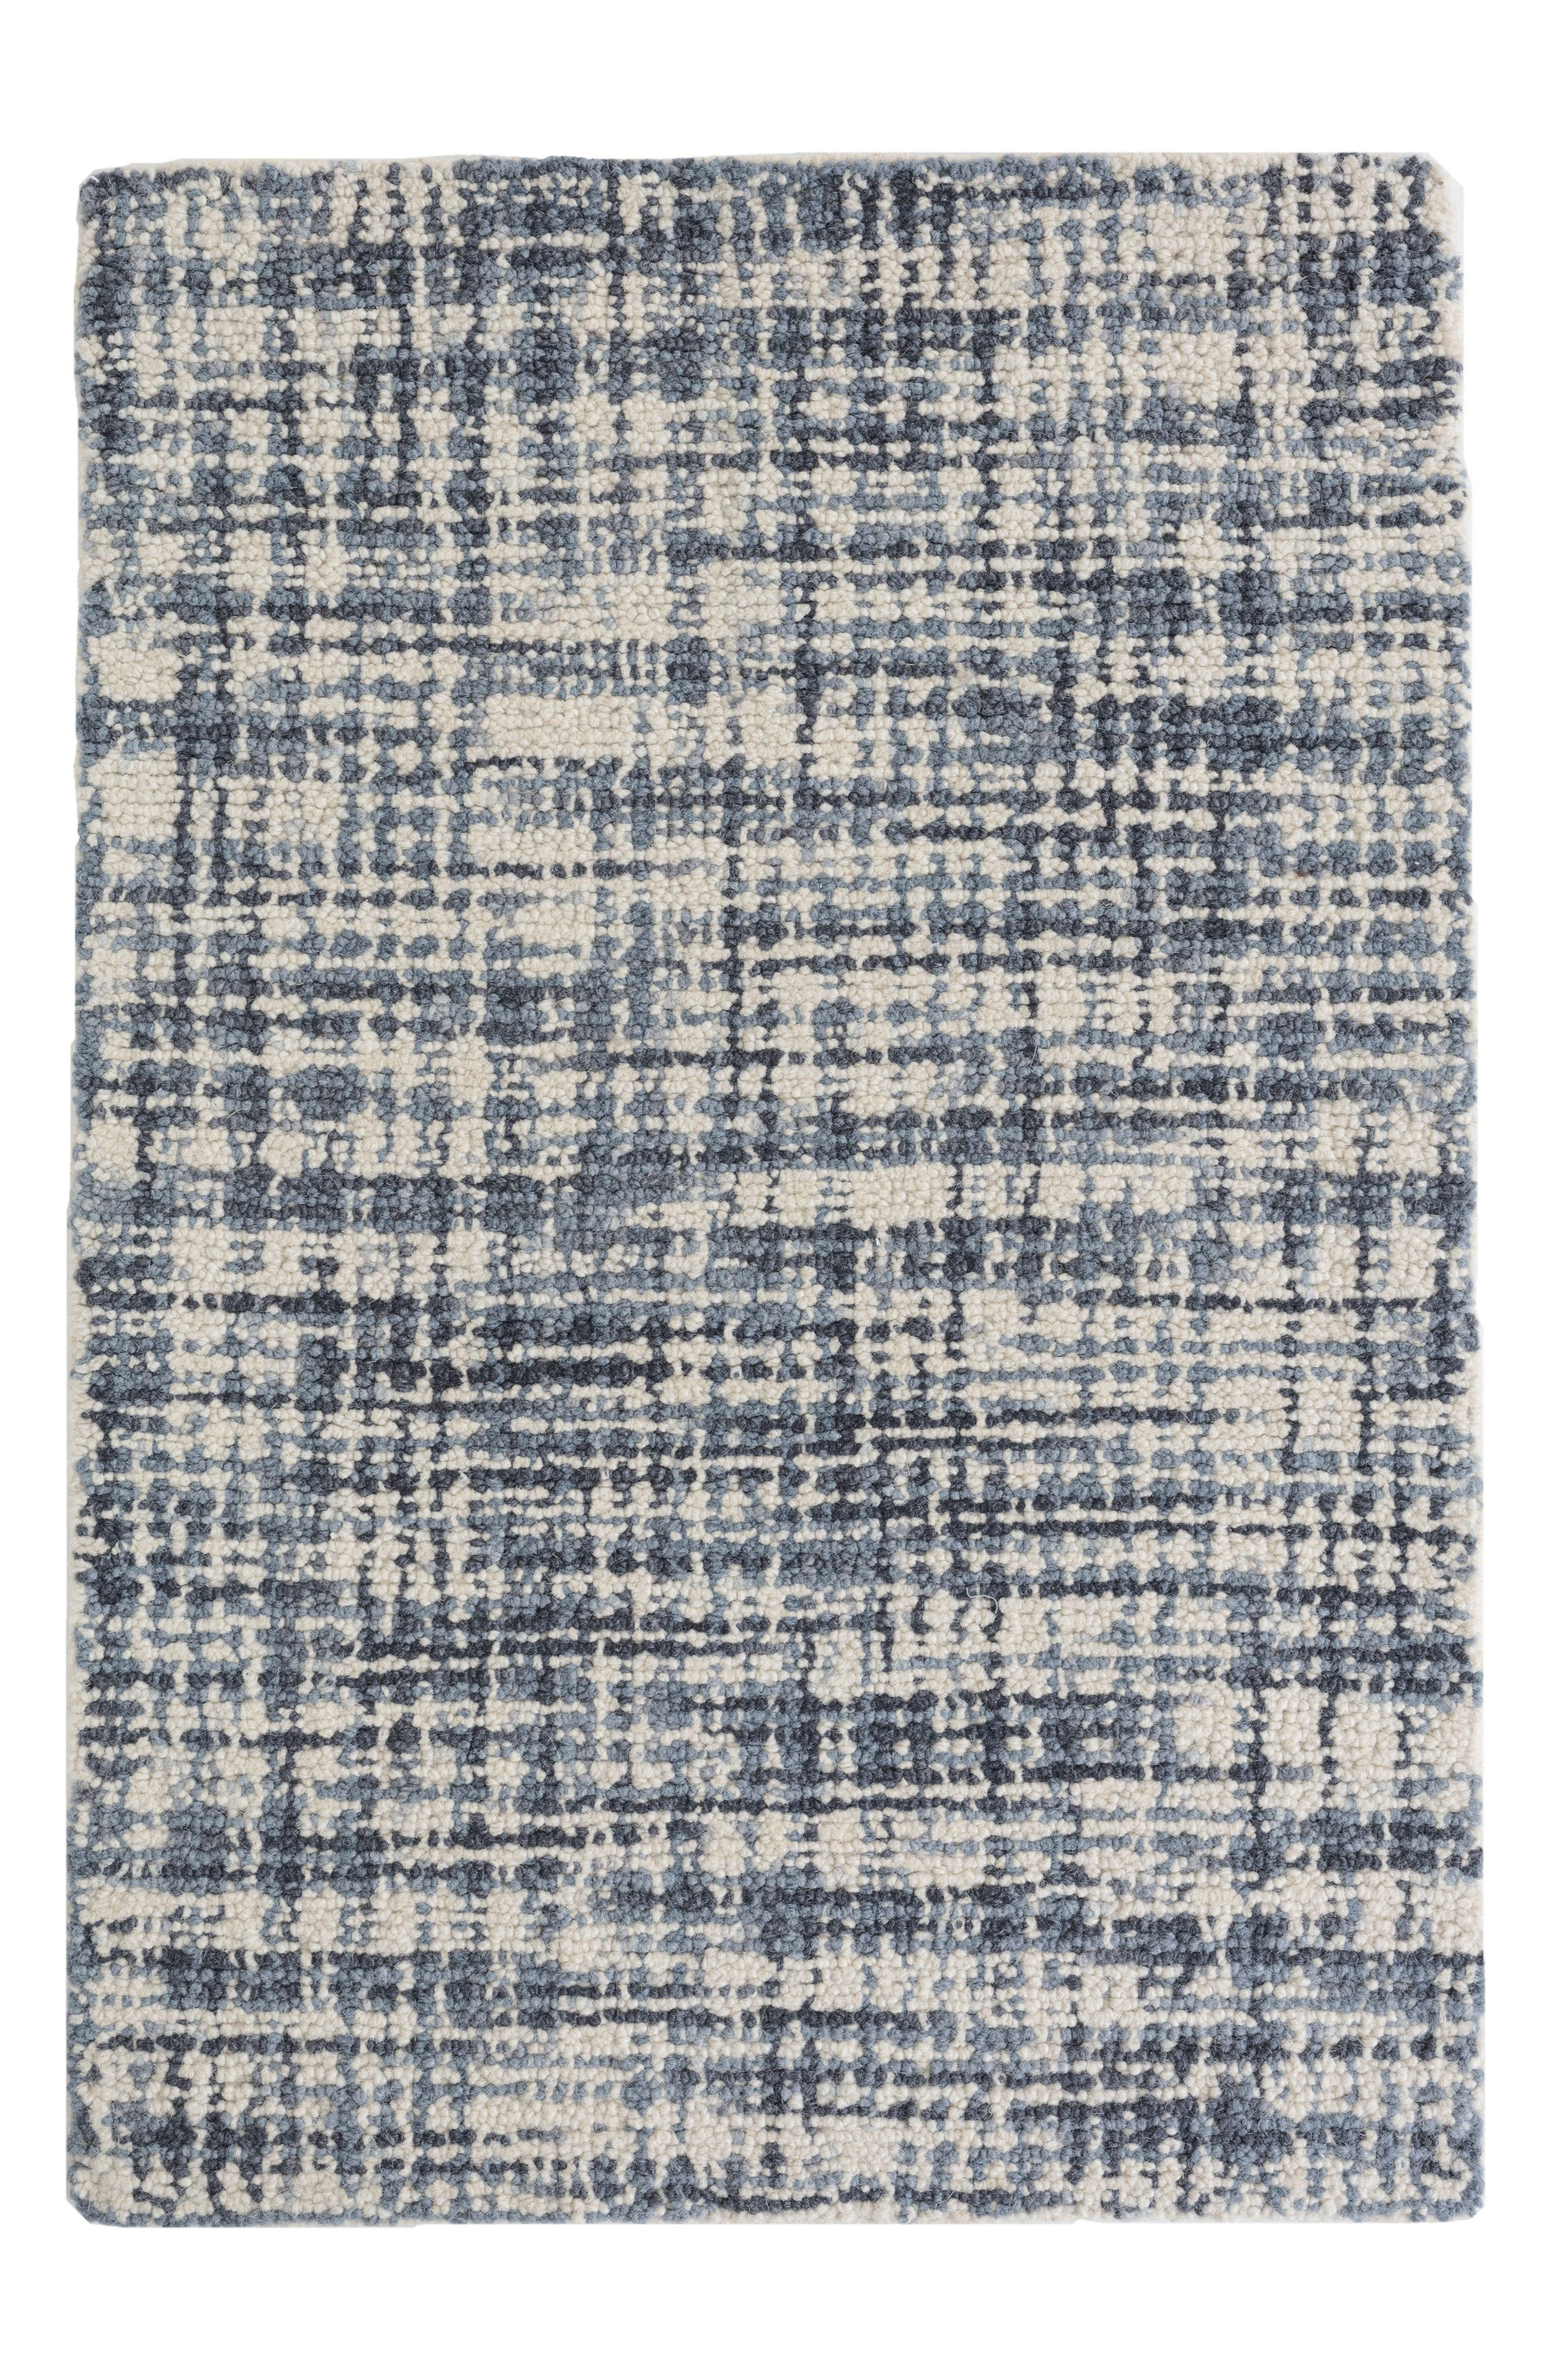 Olio Hooked Wool Rug,                         Main,                         color, BLUE